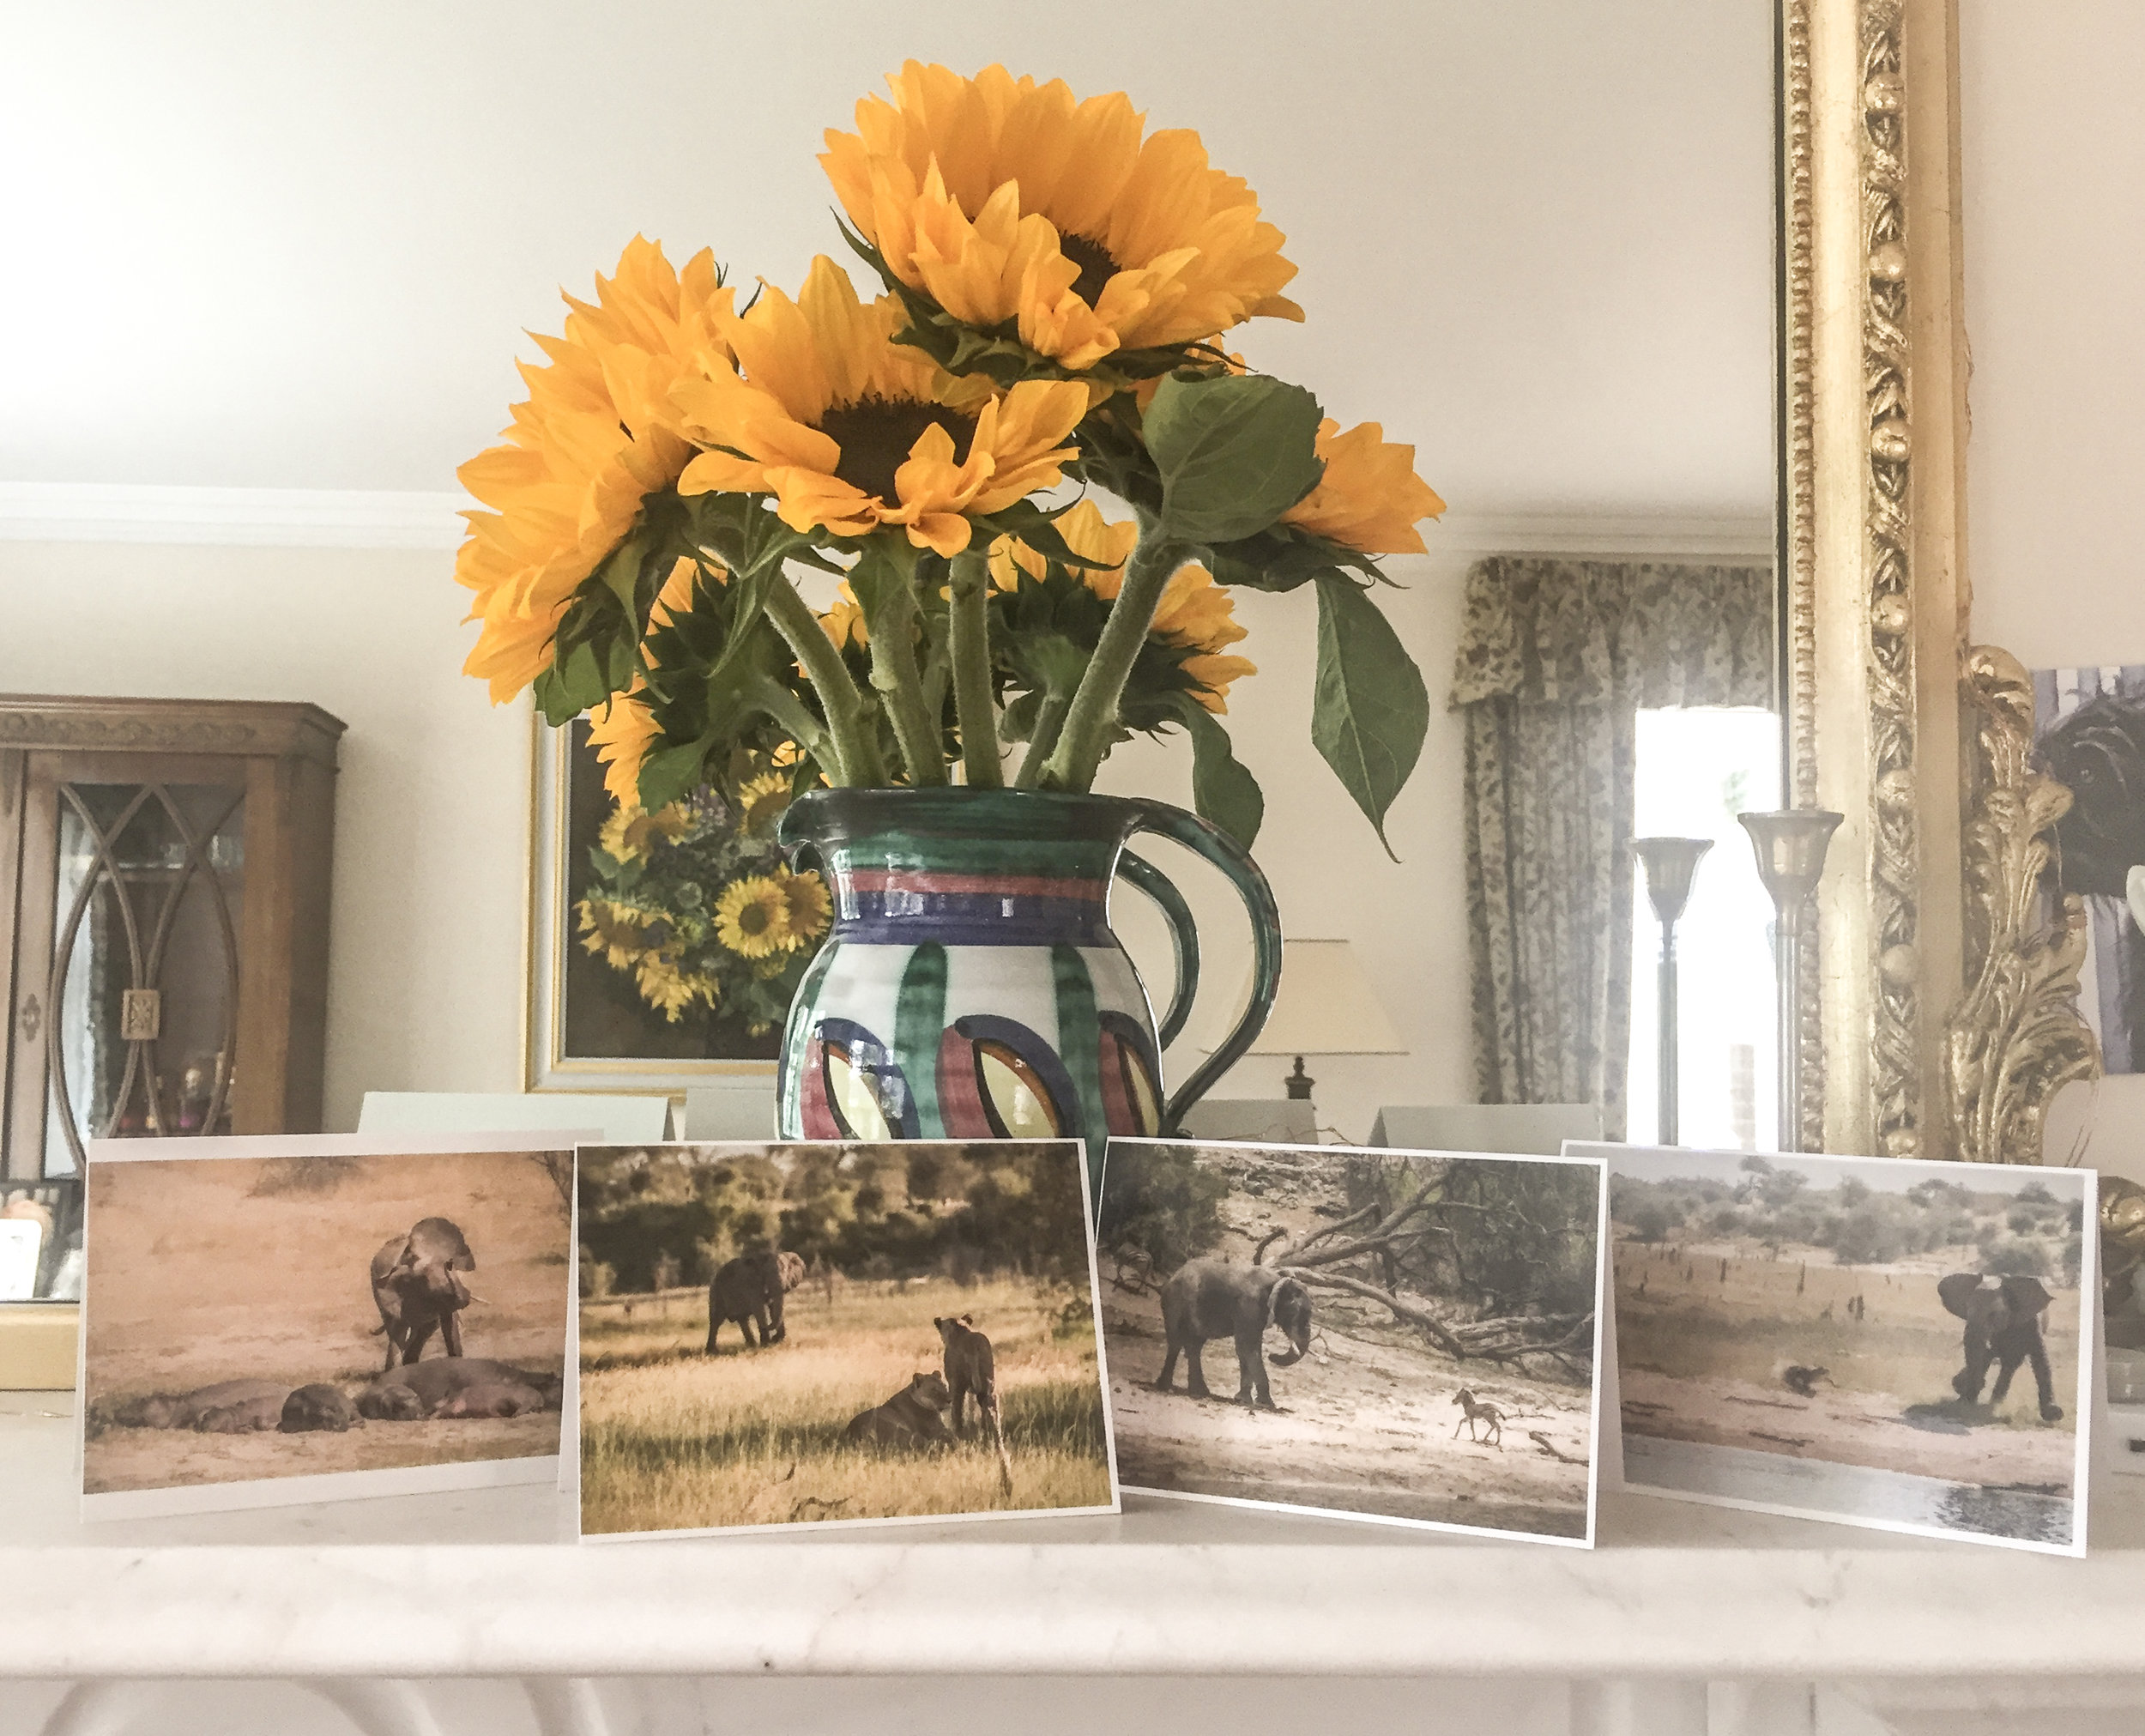 greetingscards2-2.jpg